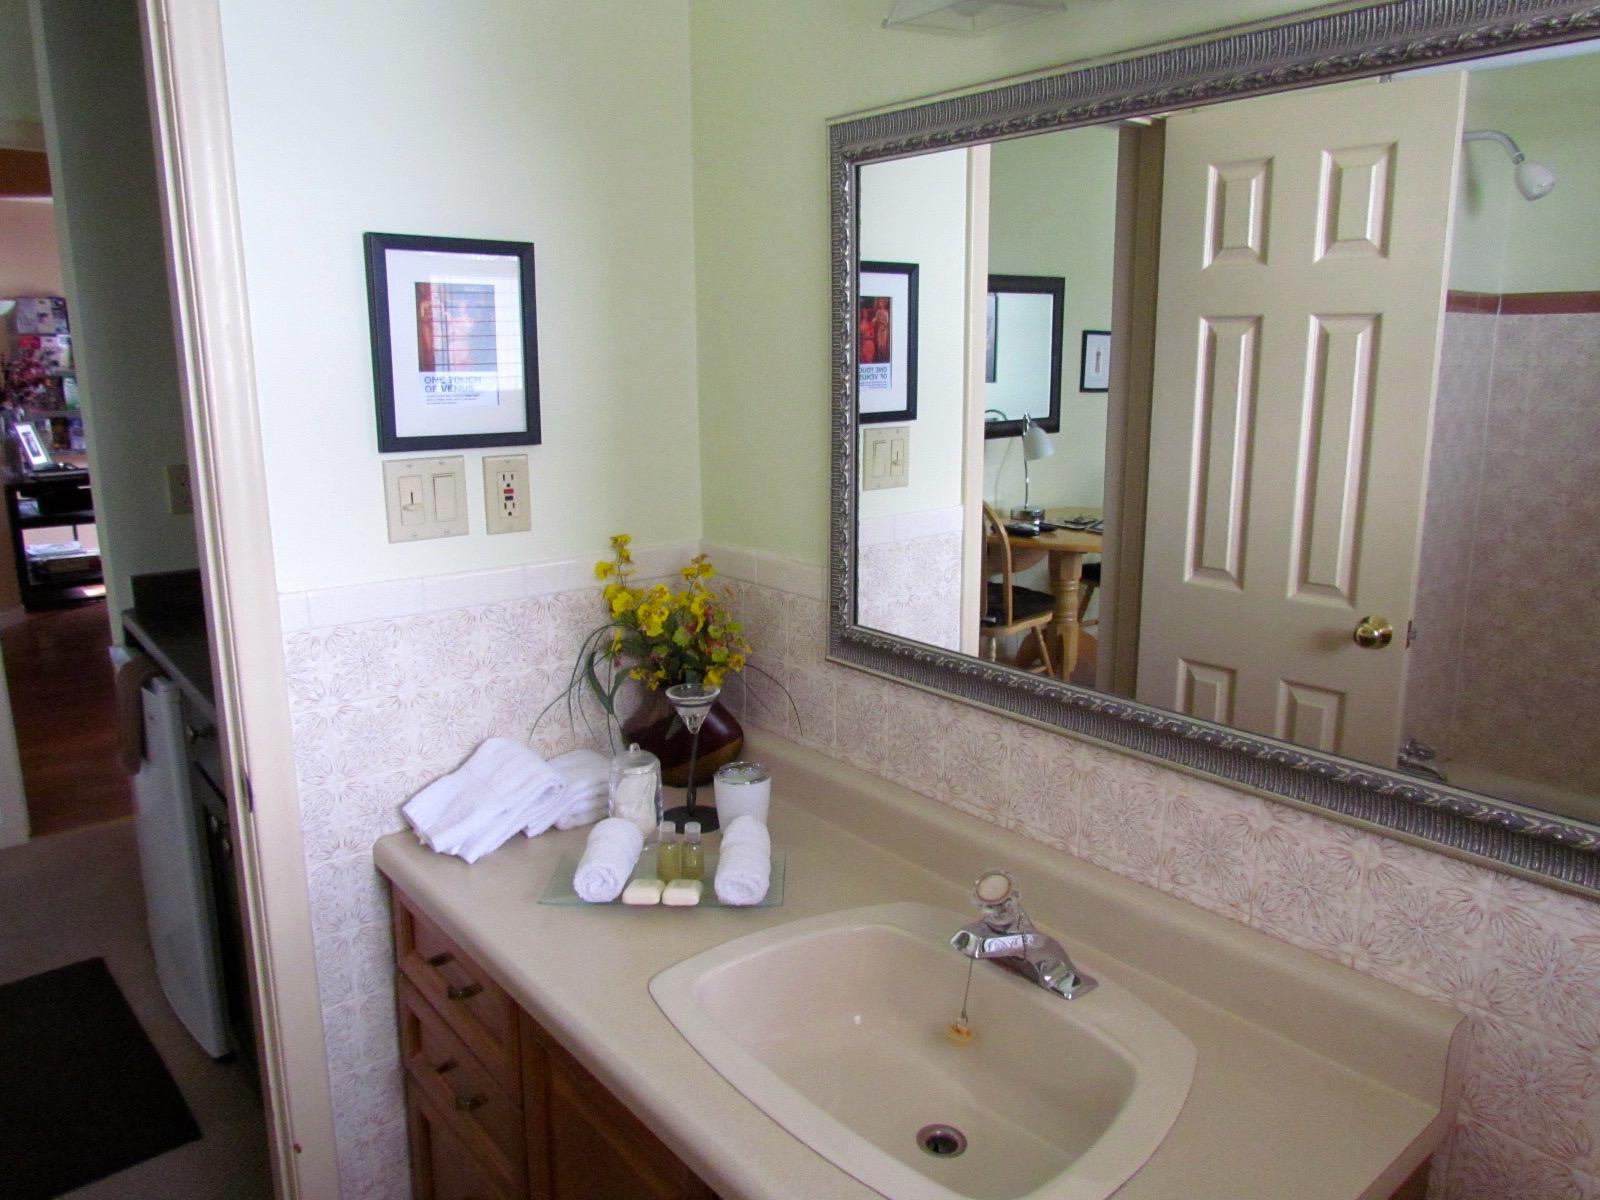 bathroom mirror art bnb b&b